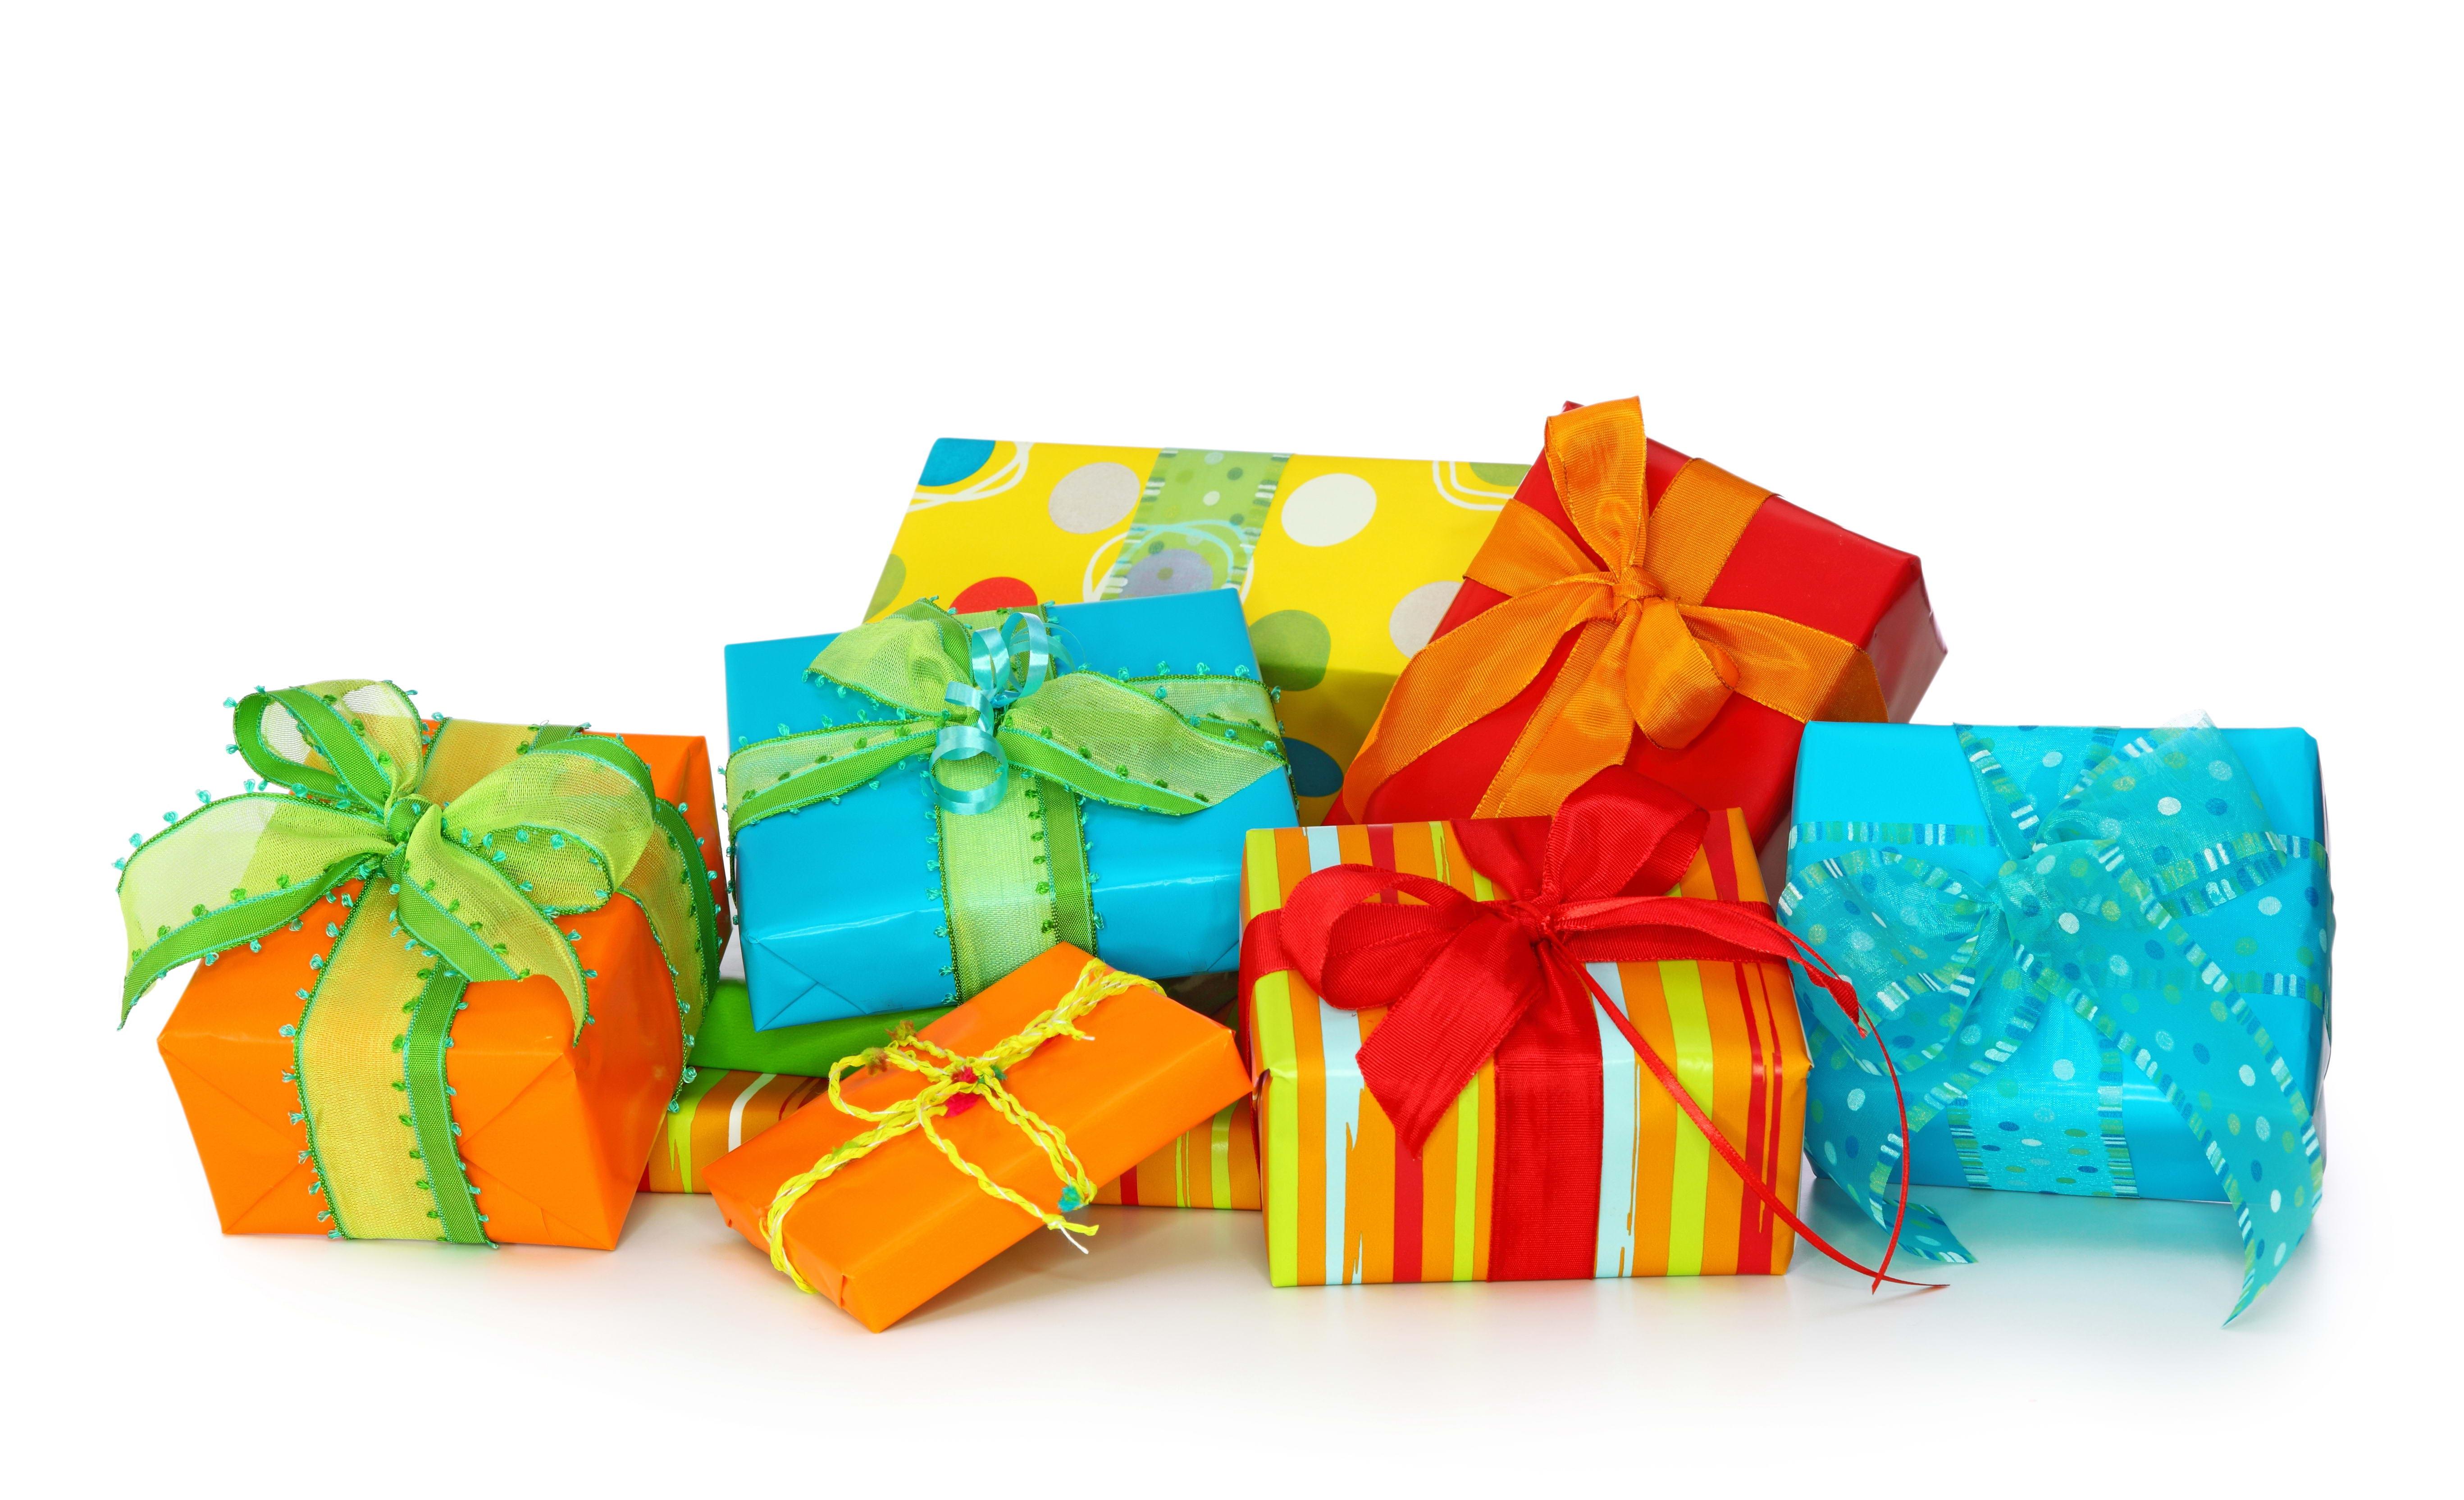 Wallpaper gift box bow ribbon white background 5468x3328 gift box bow ribbon white background negle Gallery